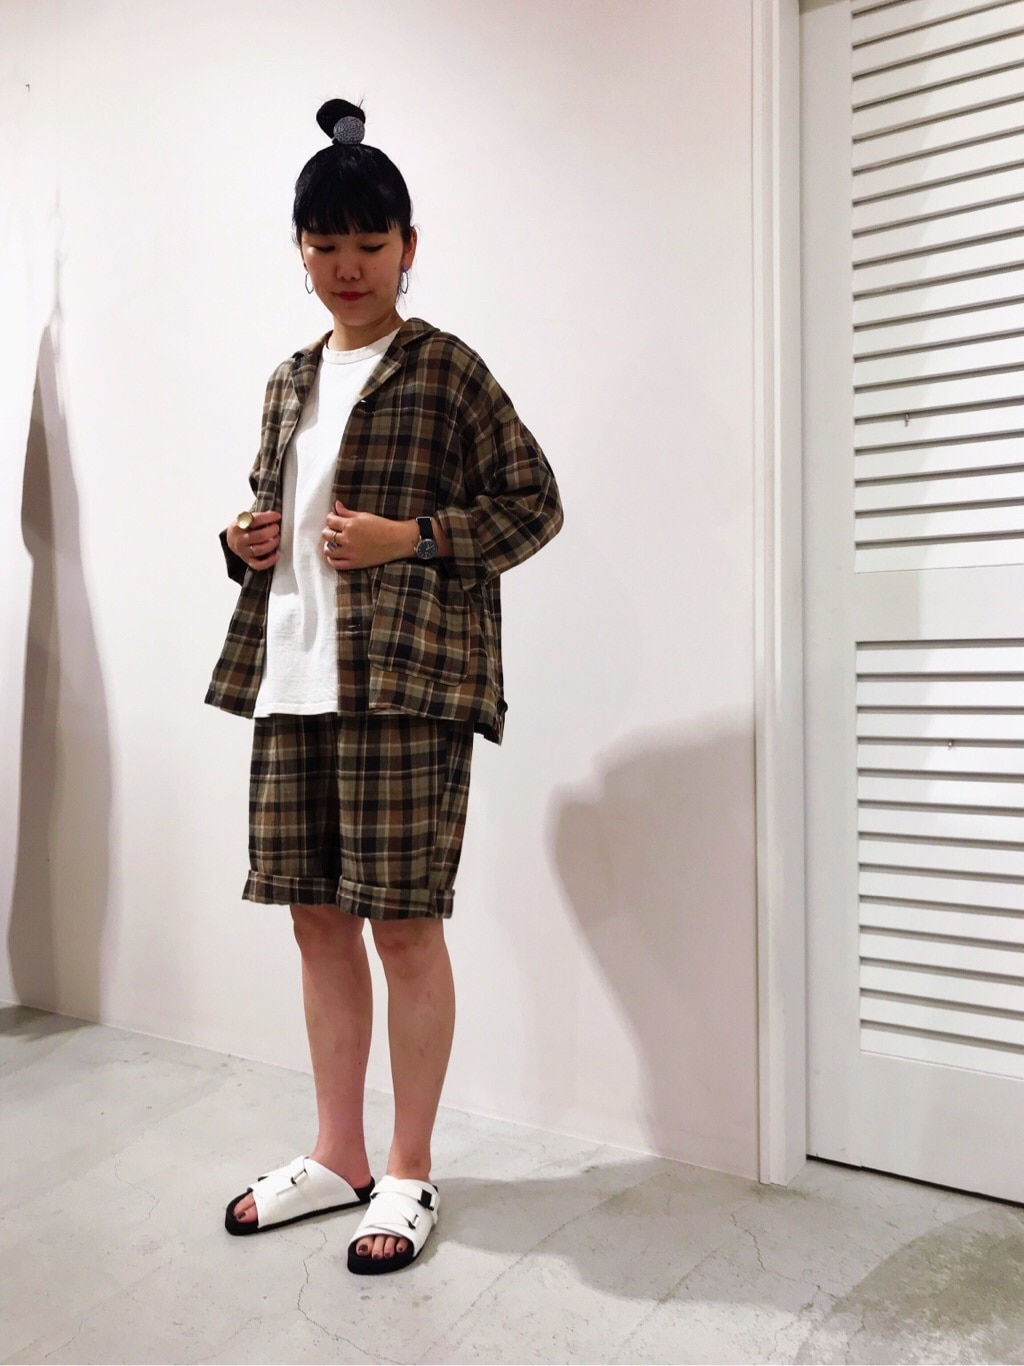 chambre de charme キラリナ京王吉祥寺 身長:161cm 2019.07.01